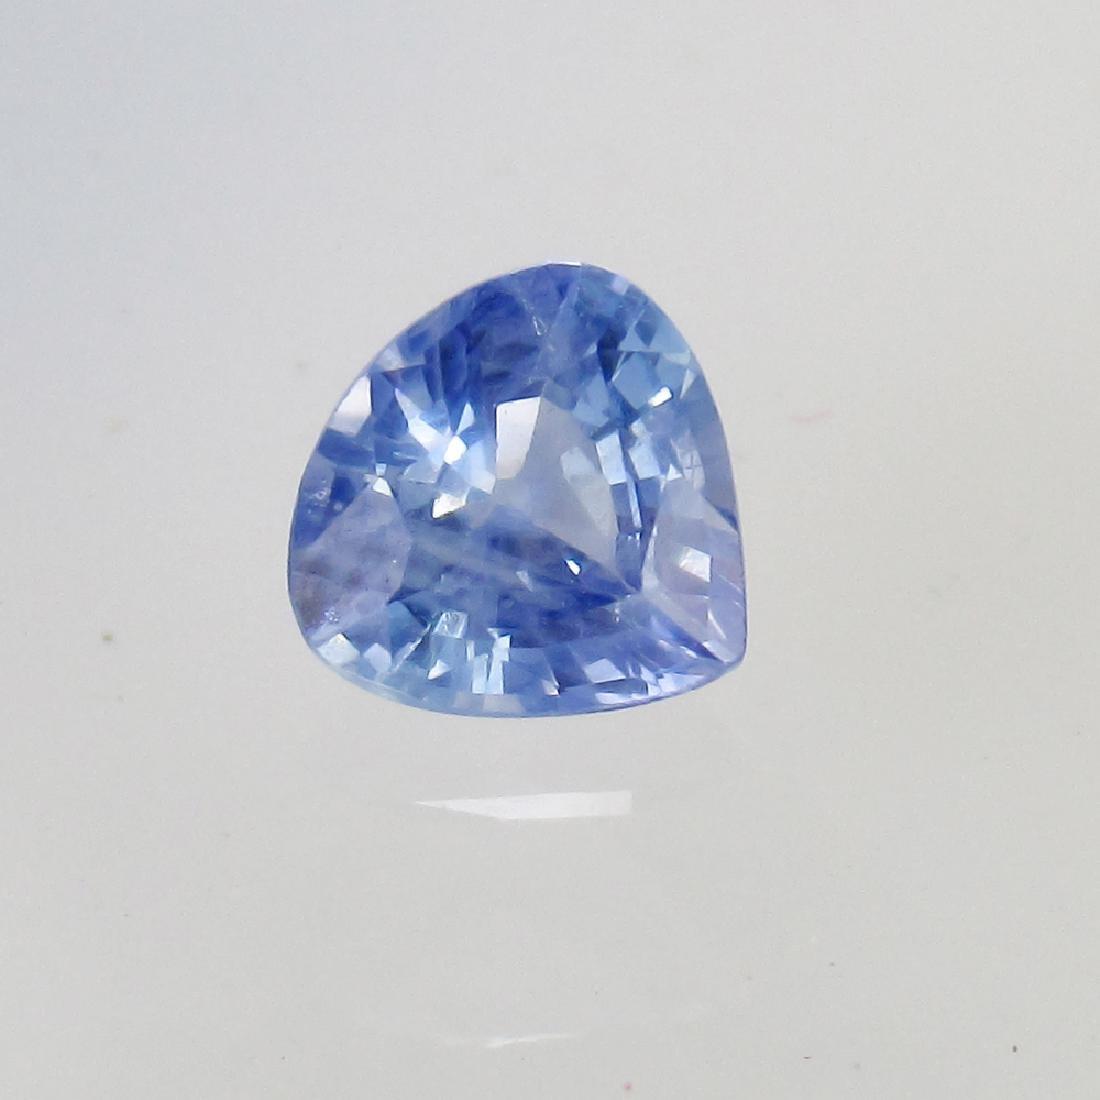 0.66 Ct Genuine Ceylon Blue Sapphire Nice Pear cut